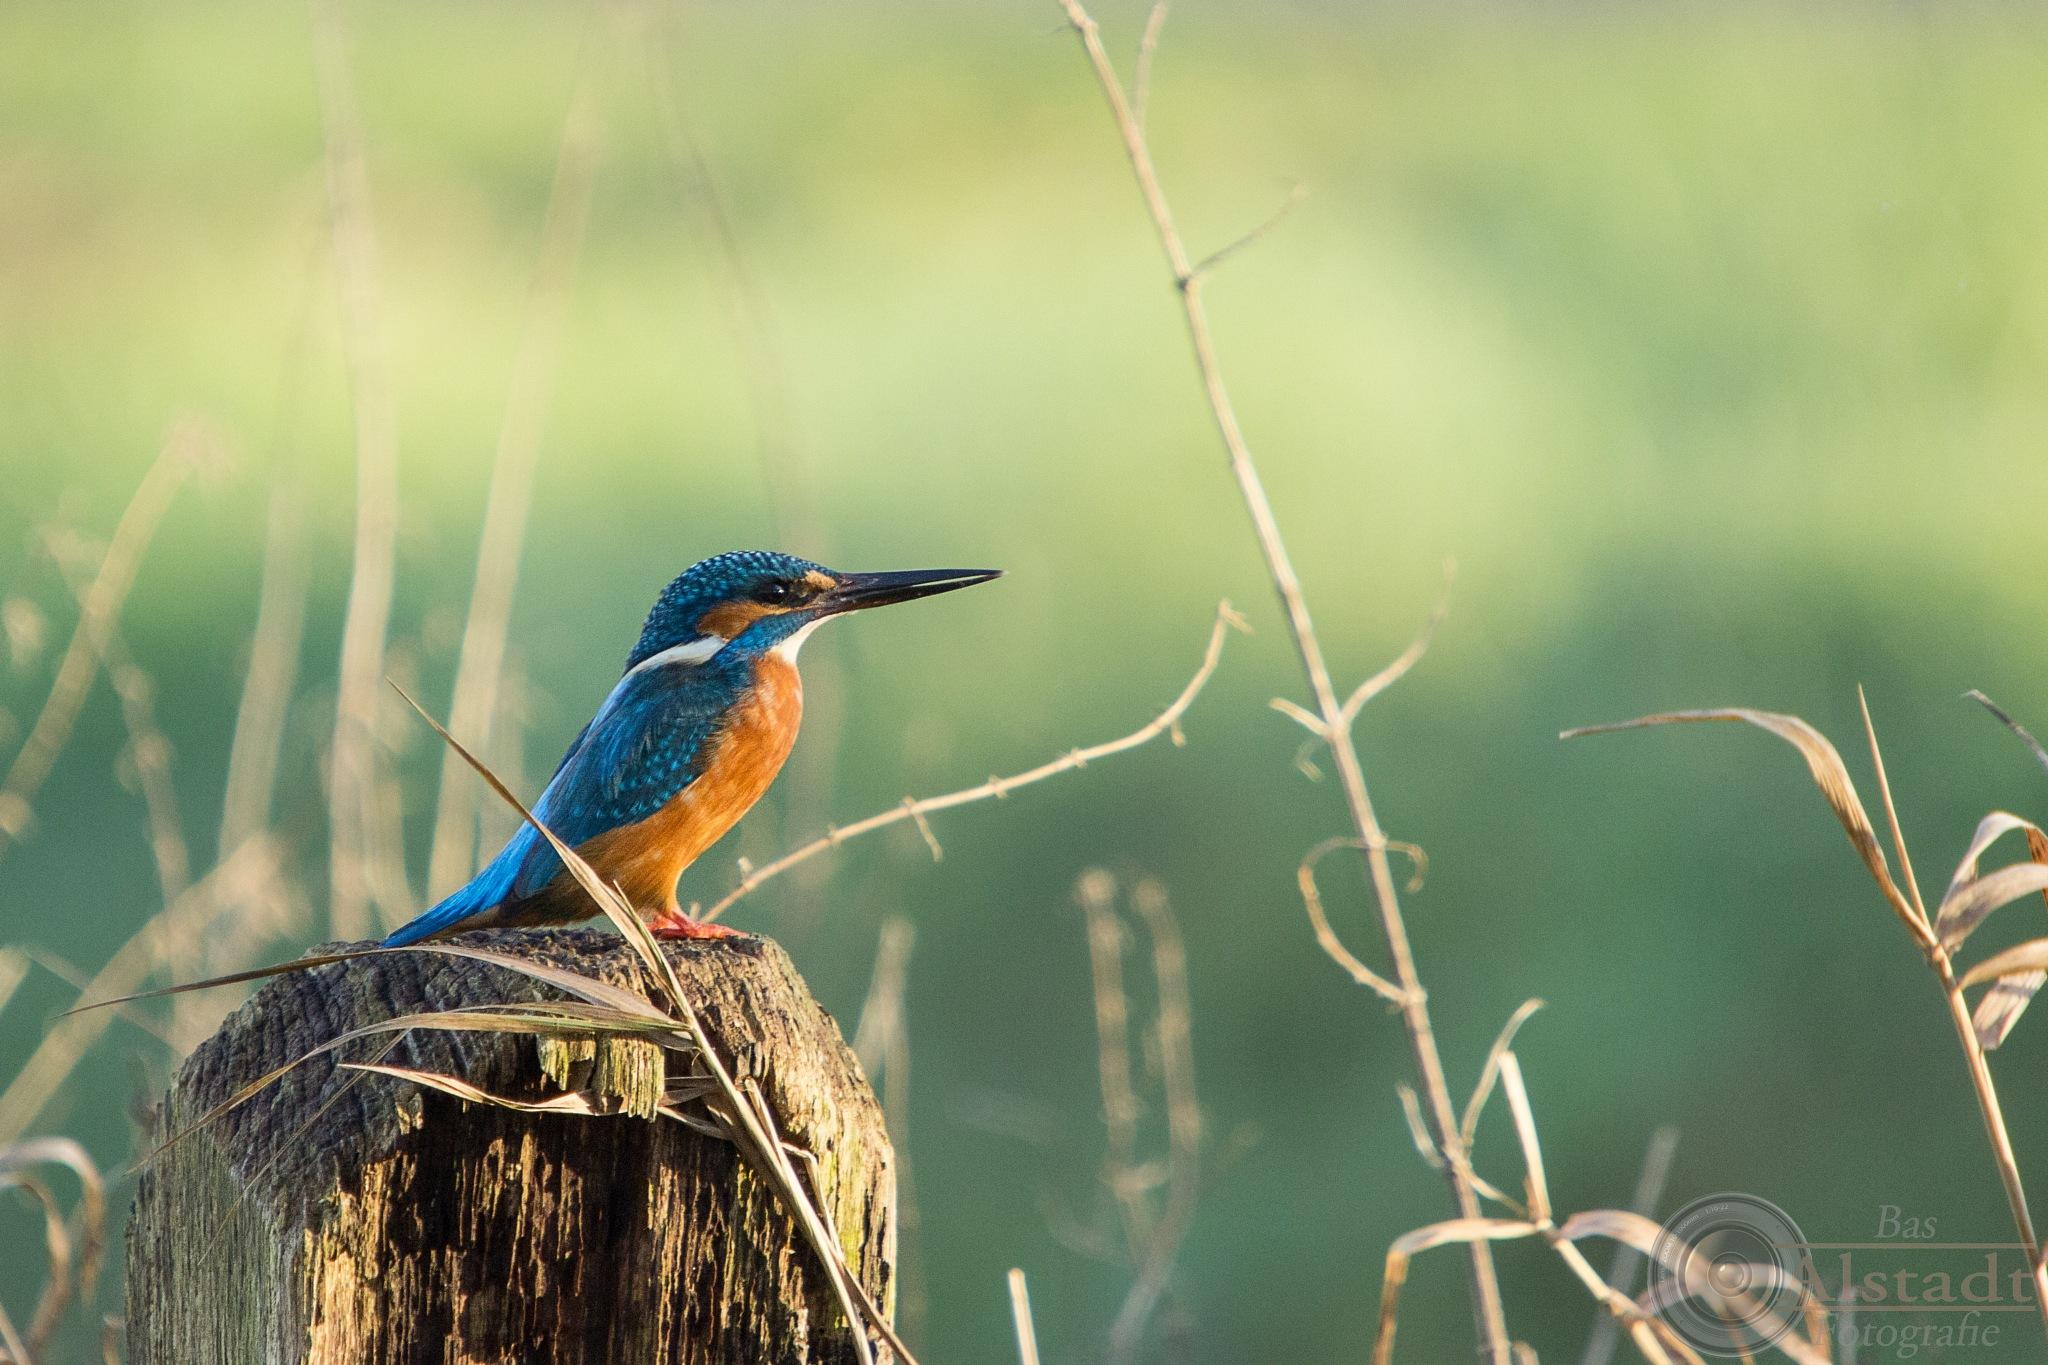 Alert Kingfisher by Bas Alstadt